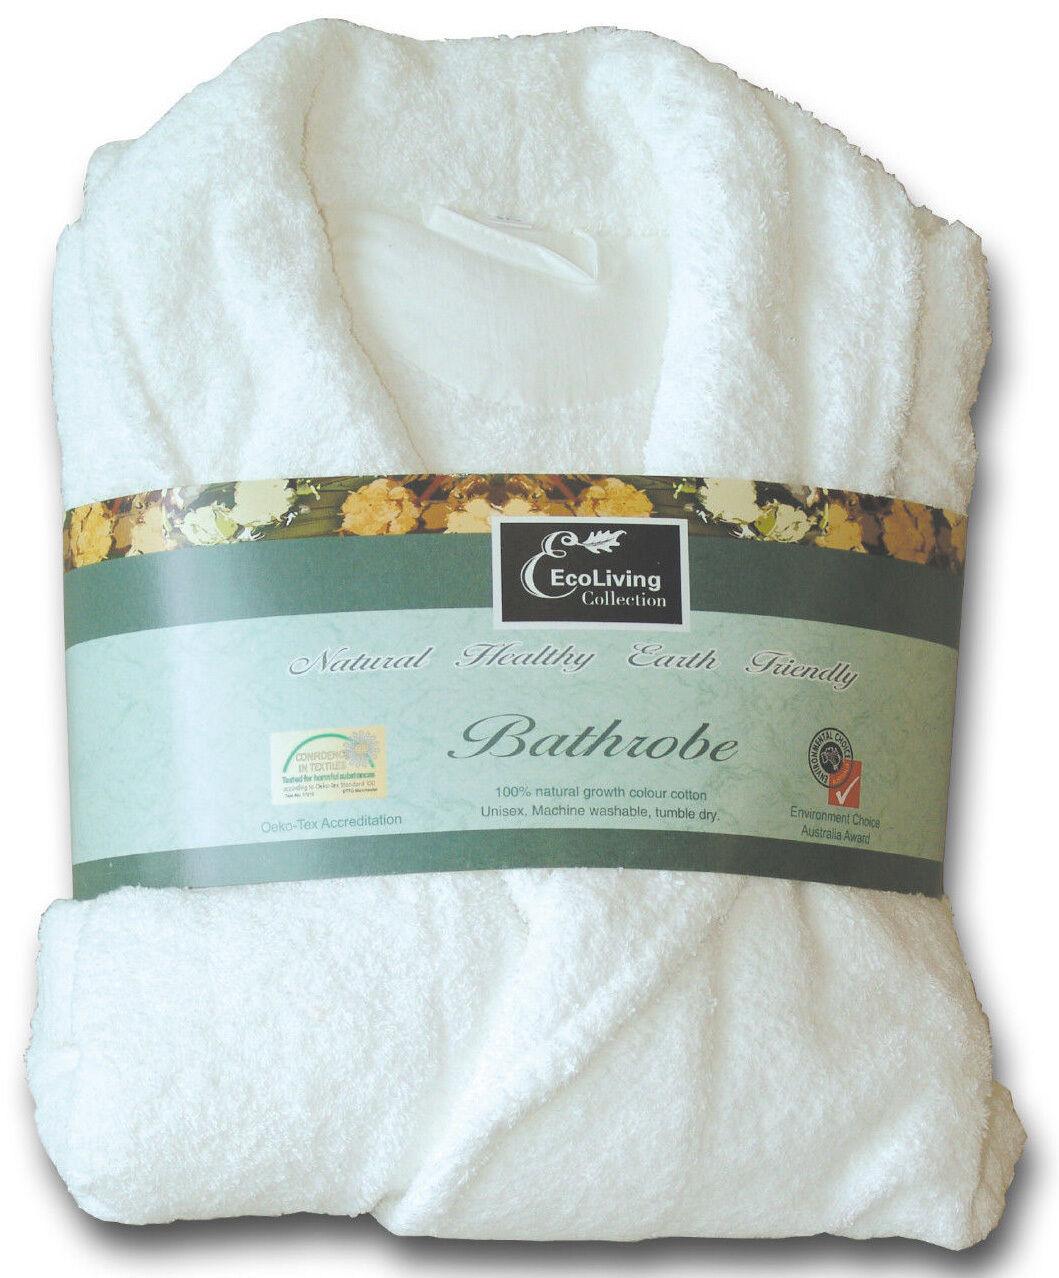 Pure Cotton L XL Größe Terry Towelling Bath Robe 550 gsm Unisex Natural Weiß